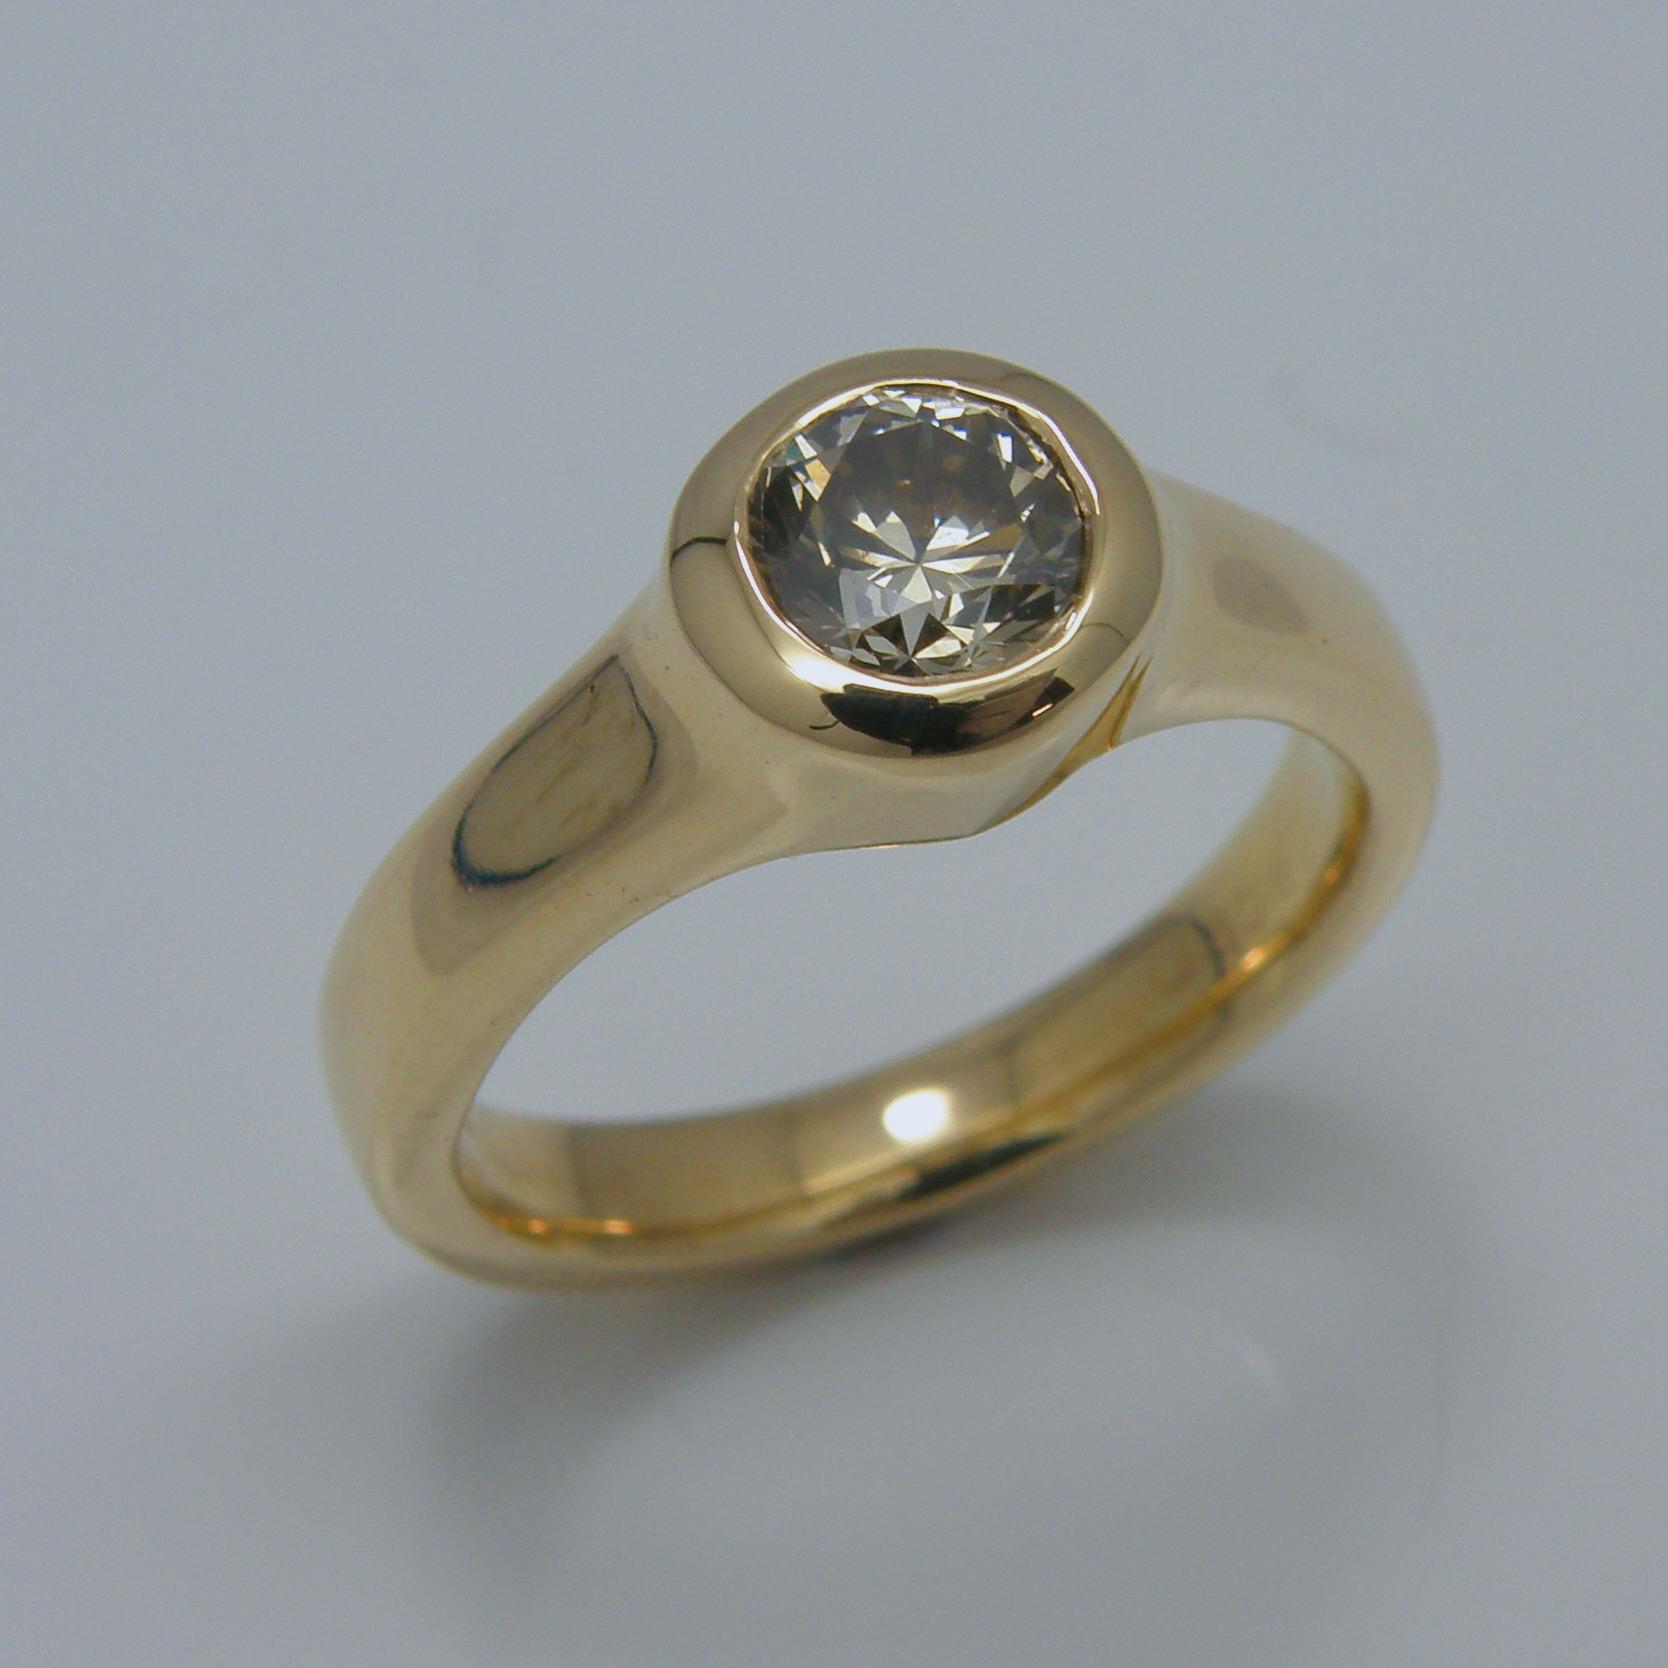 Chocolate Diamond Engagement Ring - 0.75 carat natural brown diamond set in 18 karat gold.#ChocolateDiamond #NaturalBrownDiamond